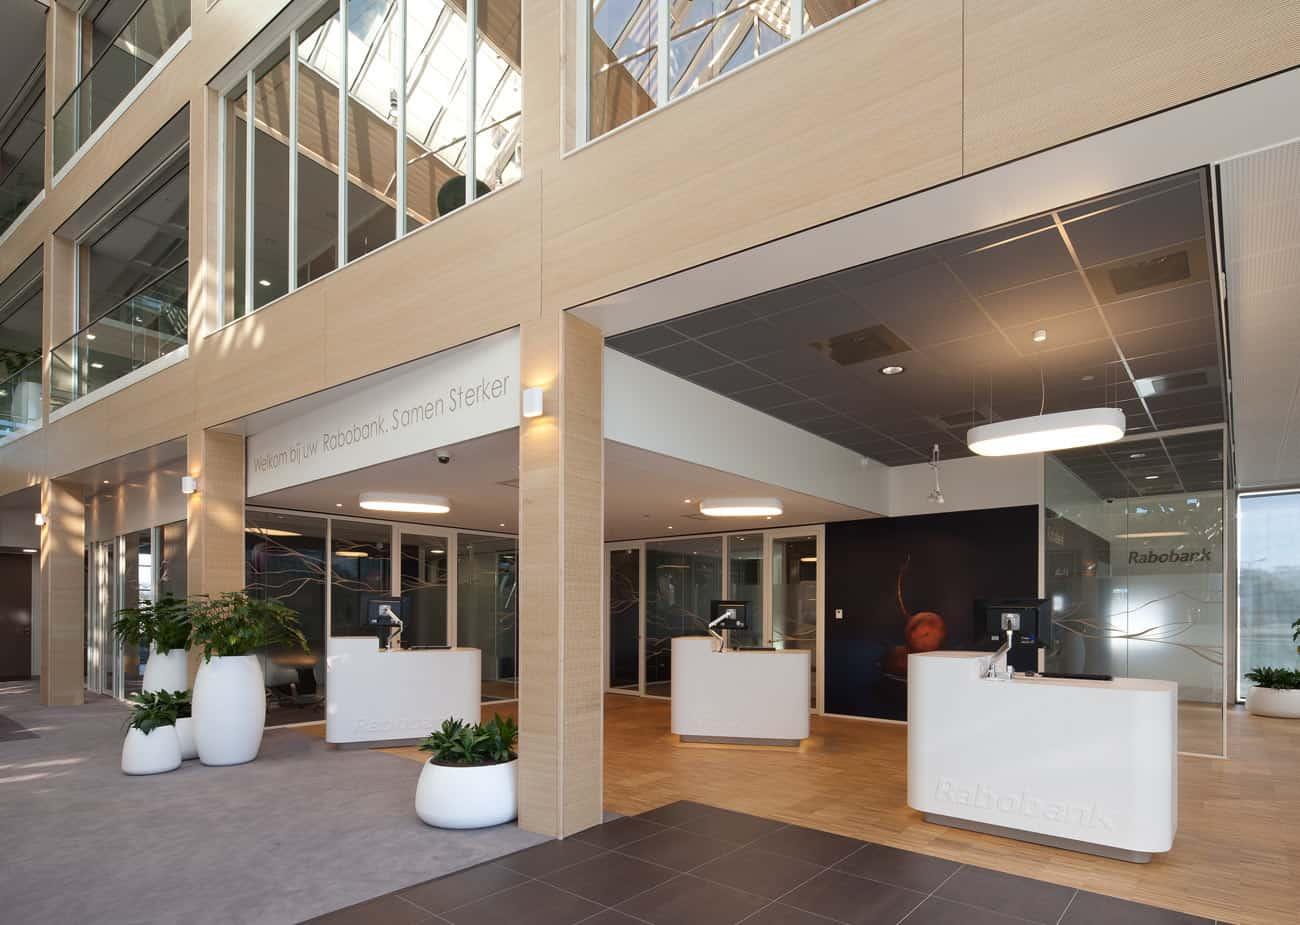 Rabobank, Hardenberg | Plan Effect